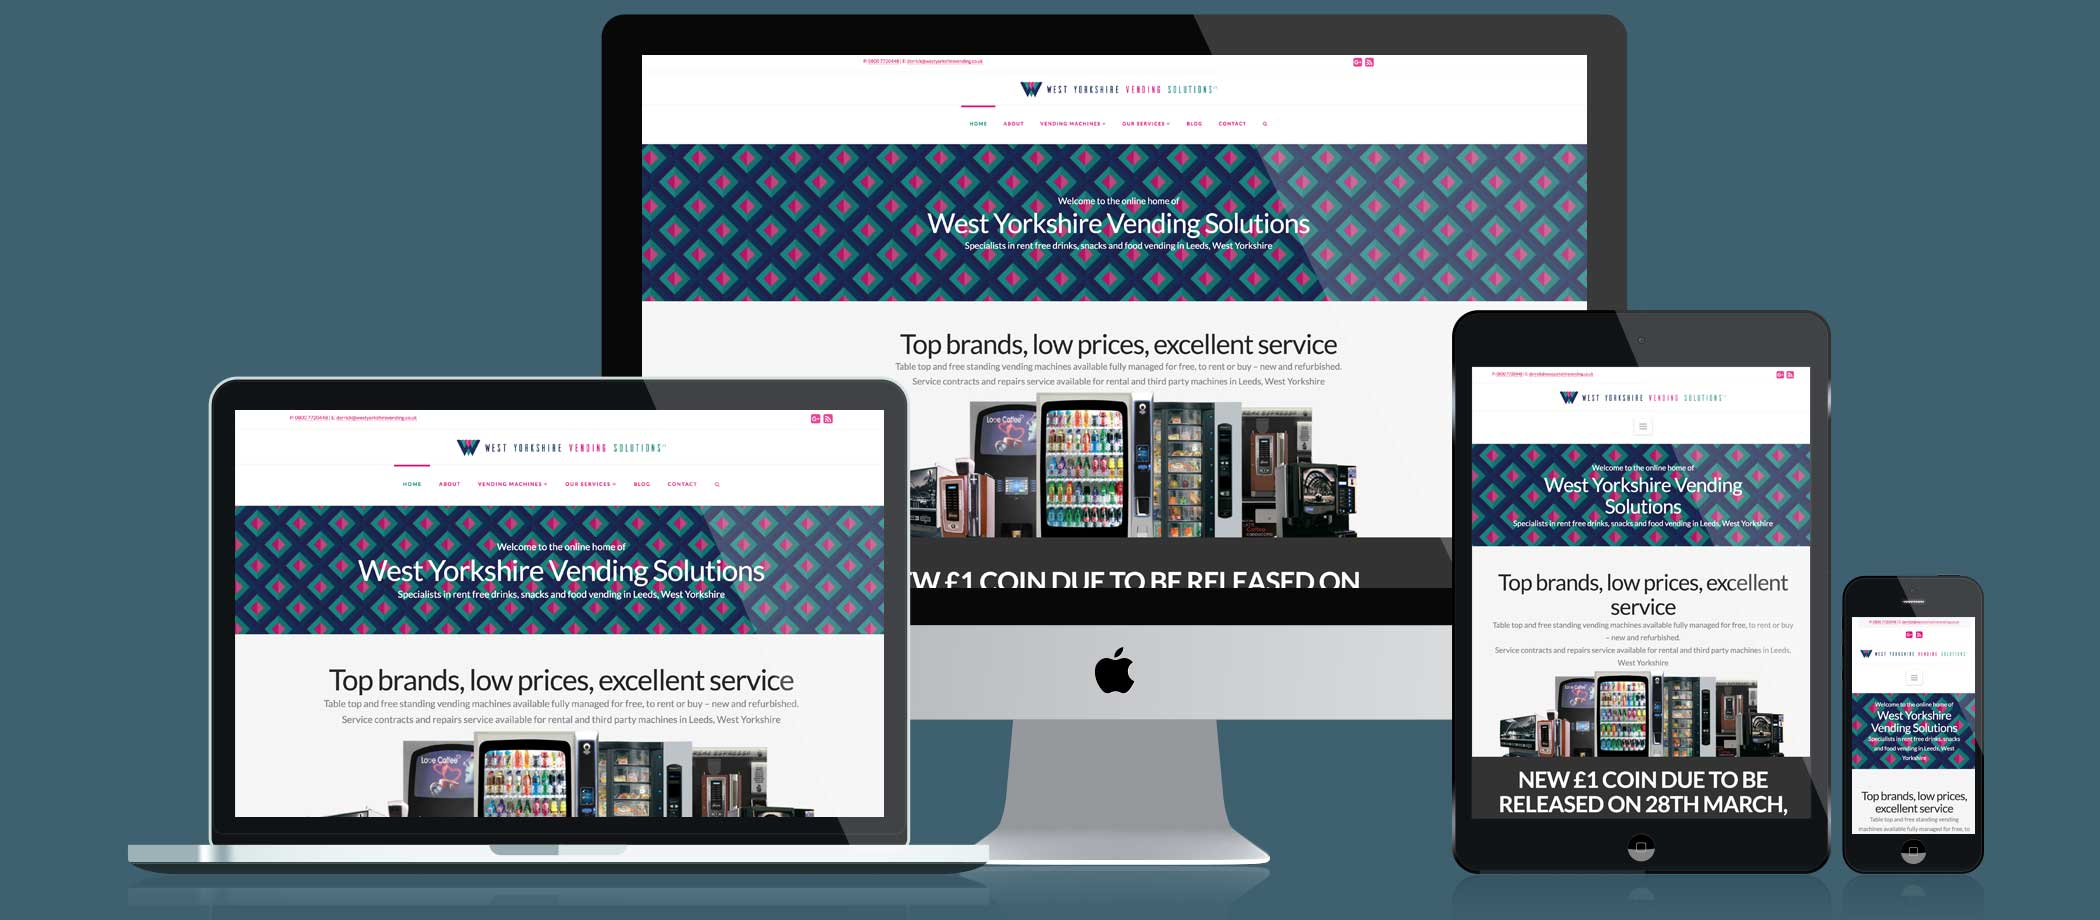 West Yorkshire Vending Solutions Website responsive displays